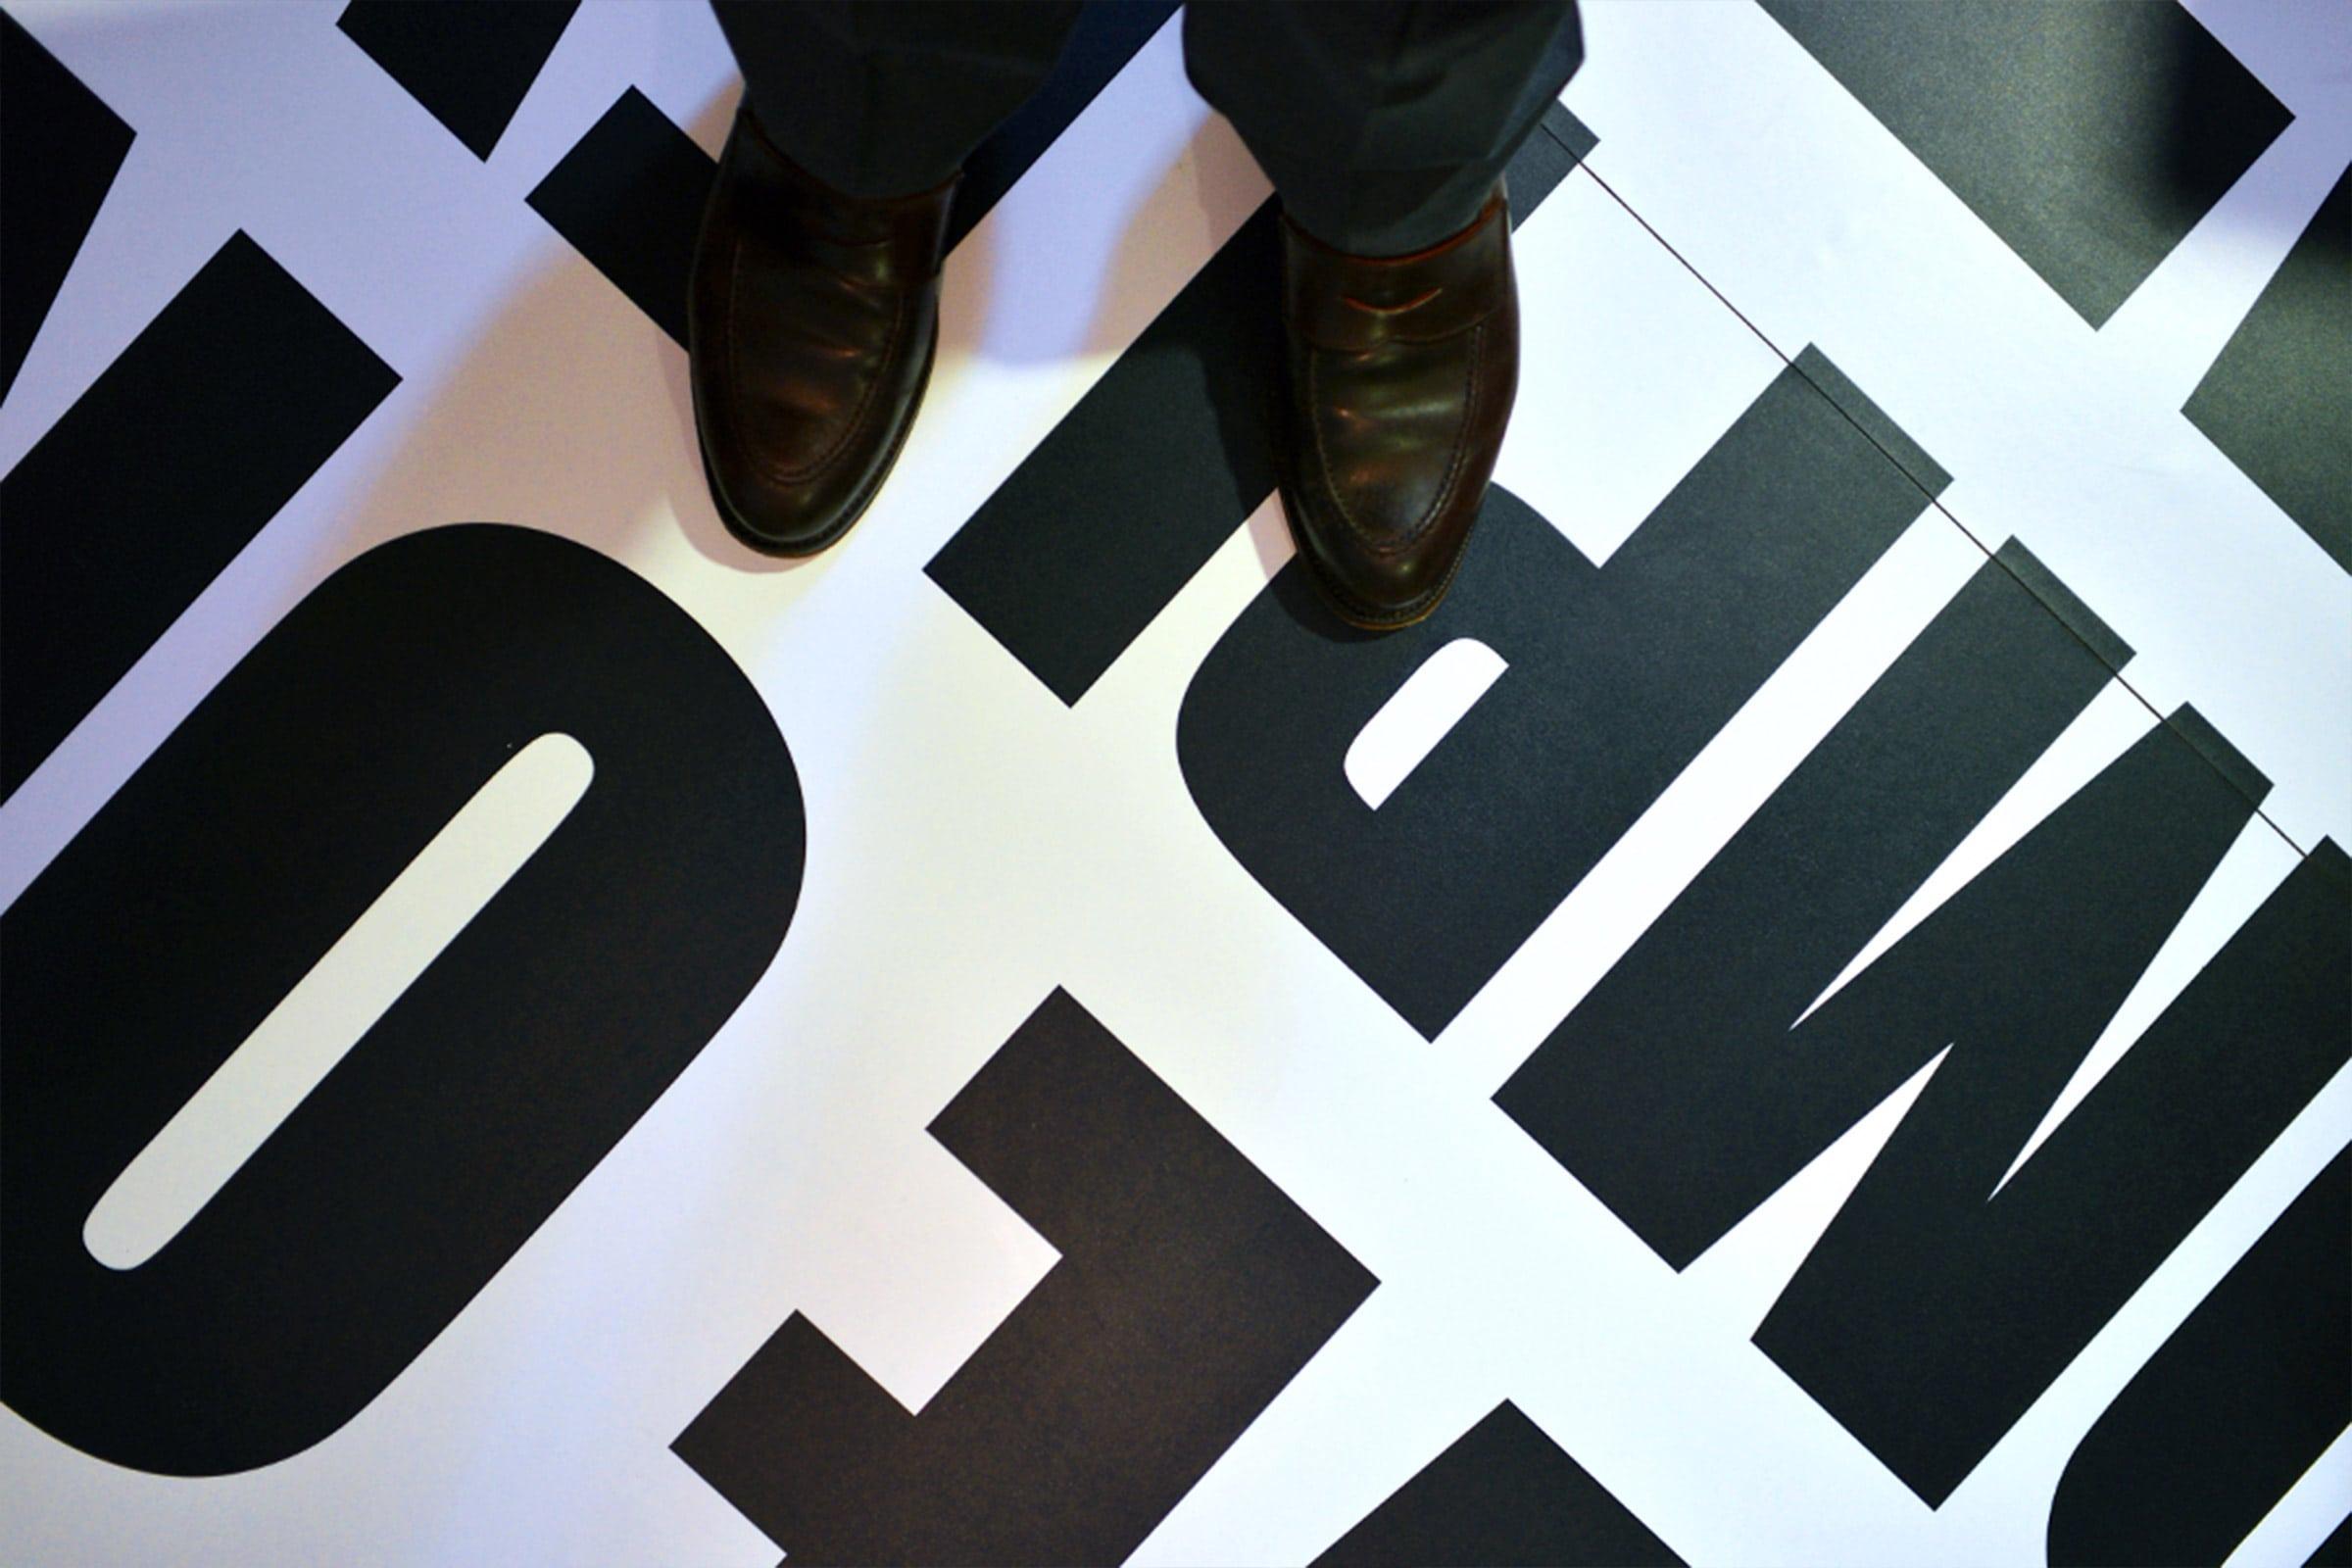 messestand, predictive medicine, big date, change perspective, corporate design